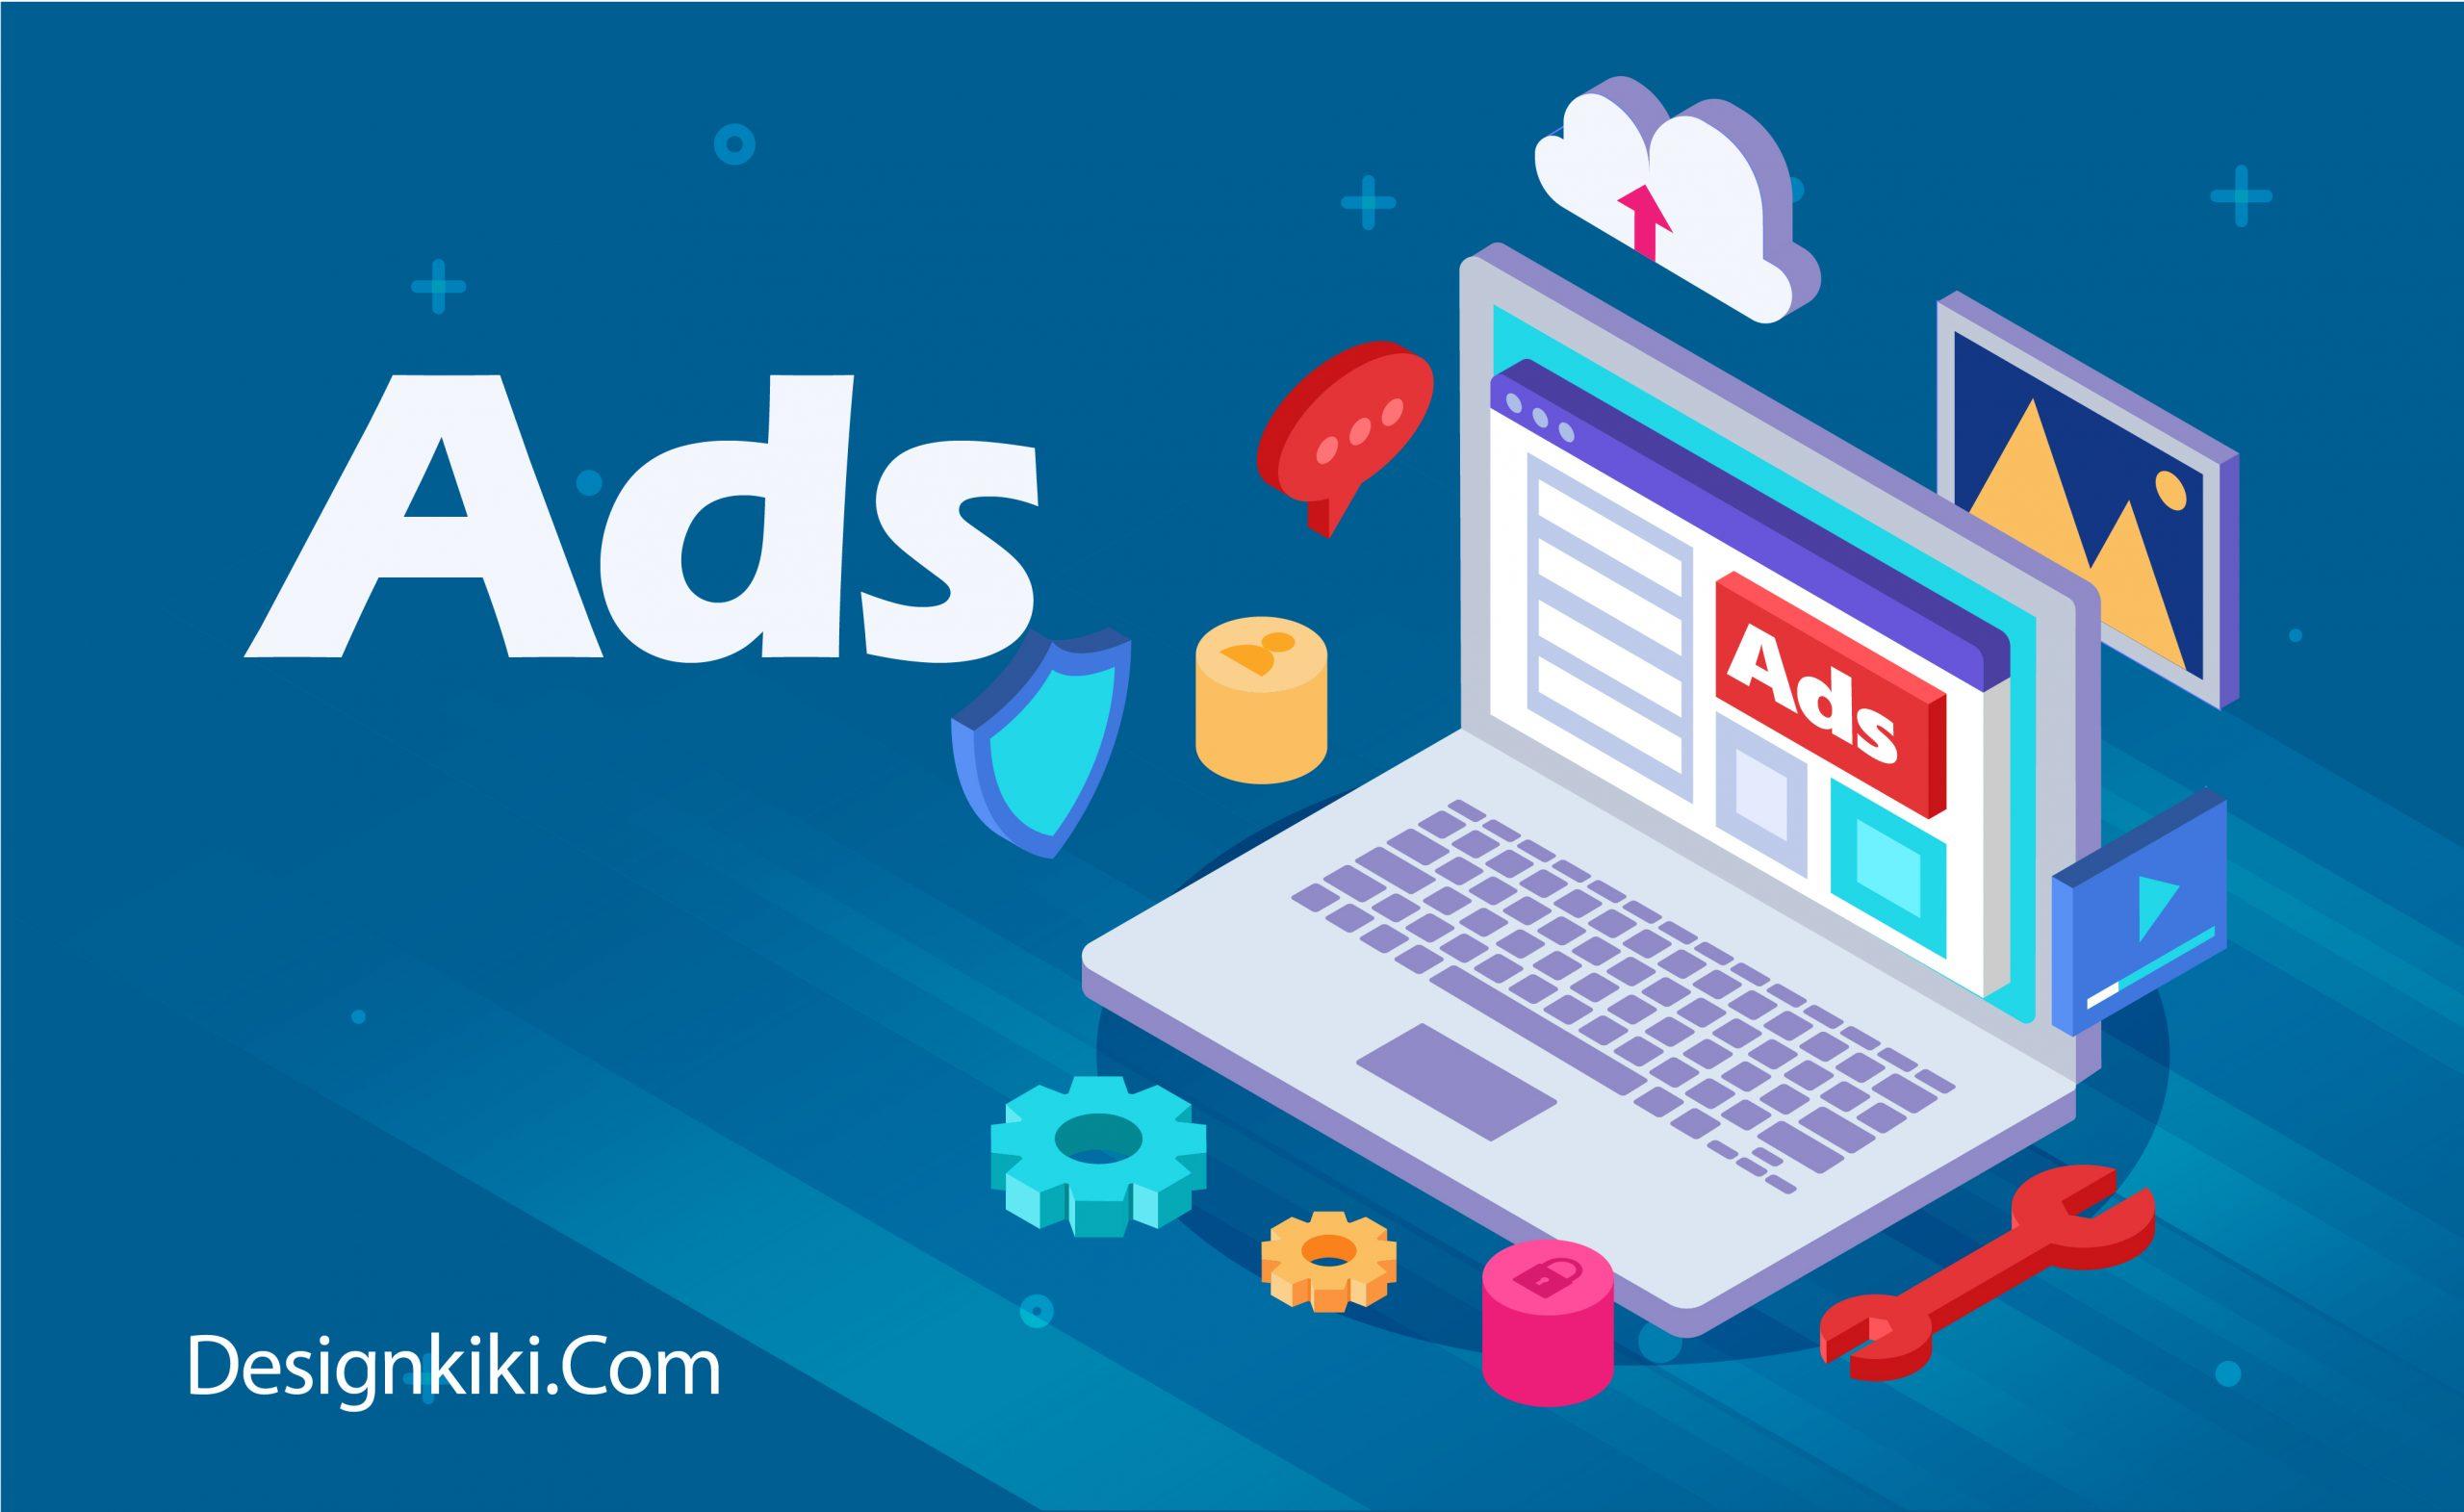 Ads on website